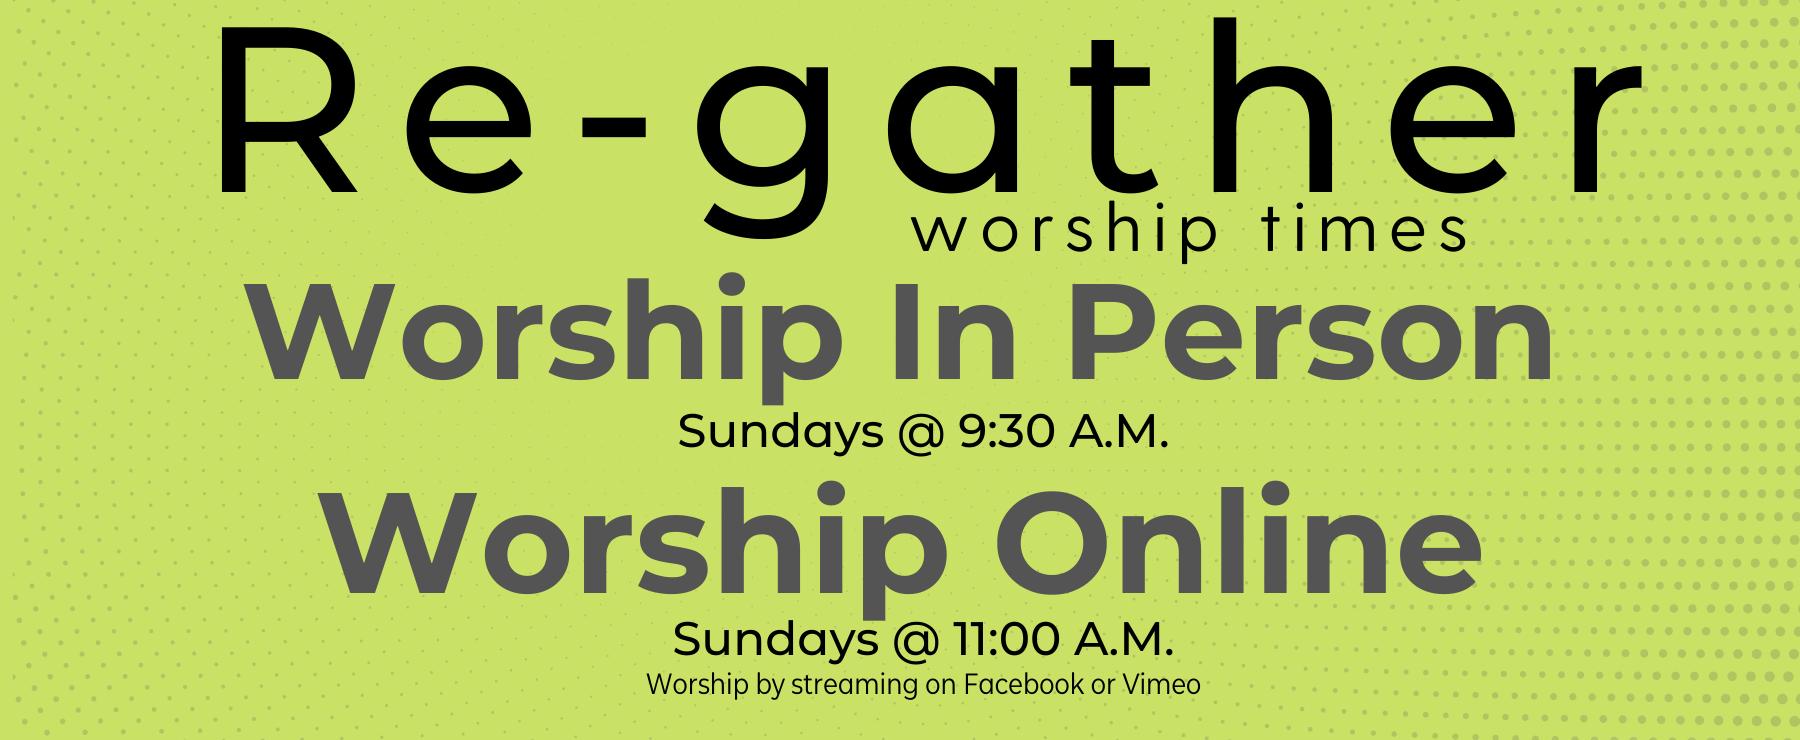 Regather worship times - Website